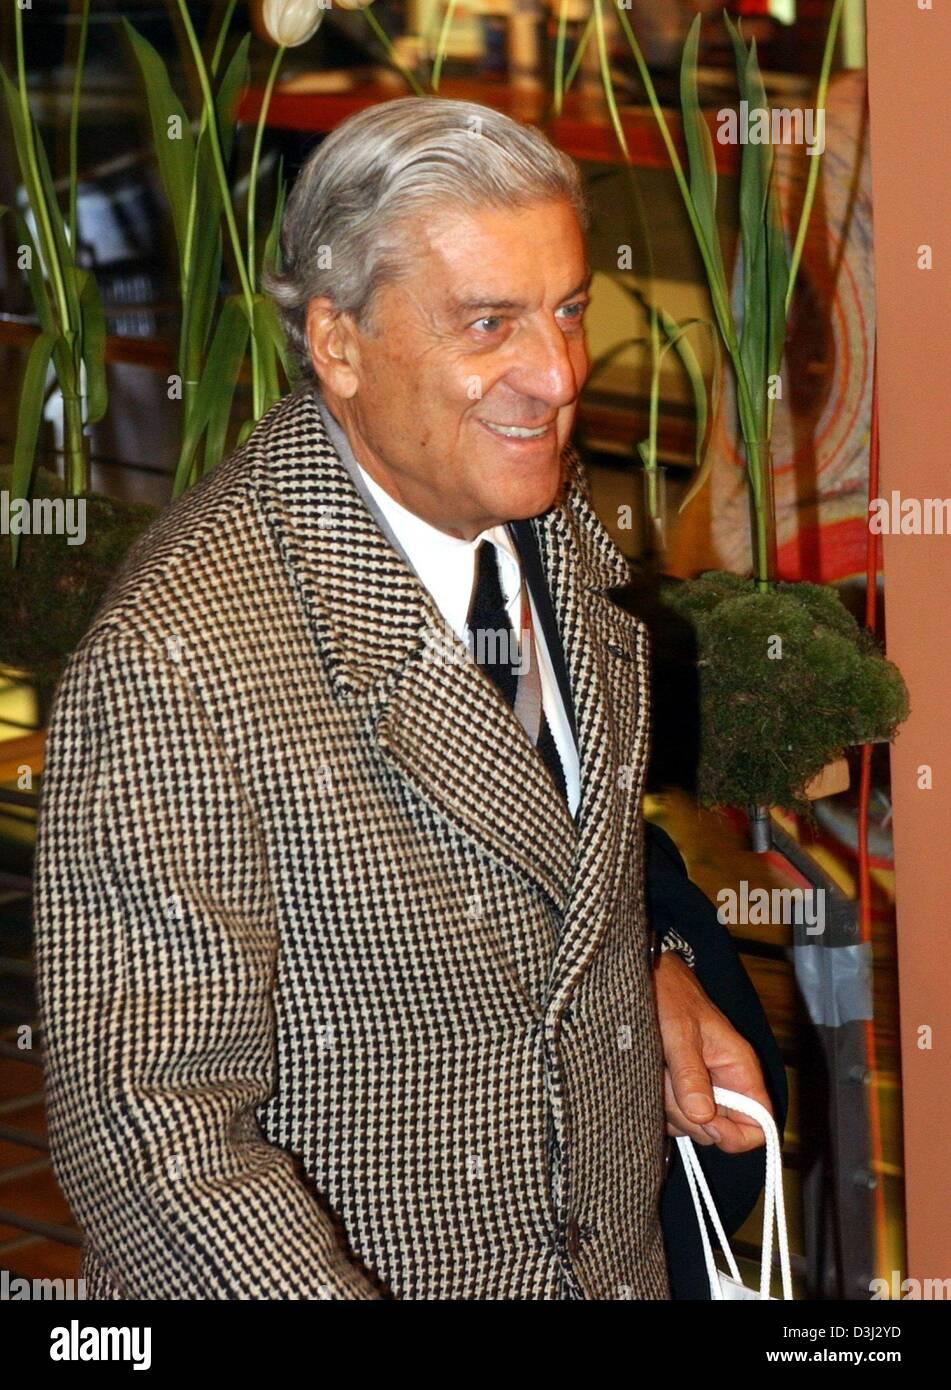 (dpa) - Italian fashion designer Nino Cerruti smiles on his arrival to the premiere of the film 'Somethings - Stock Image